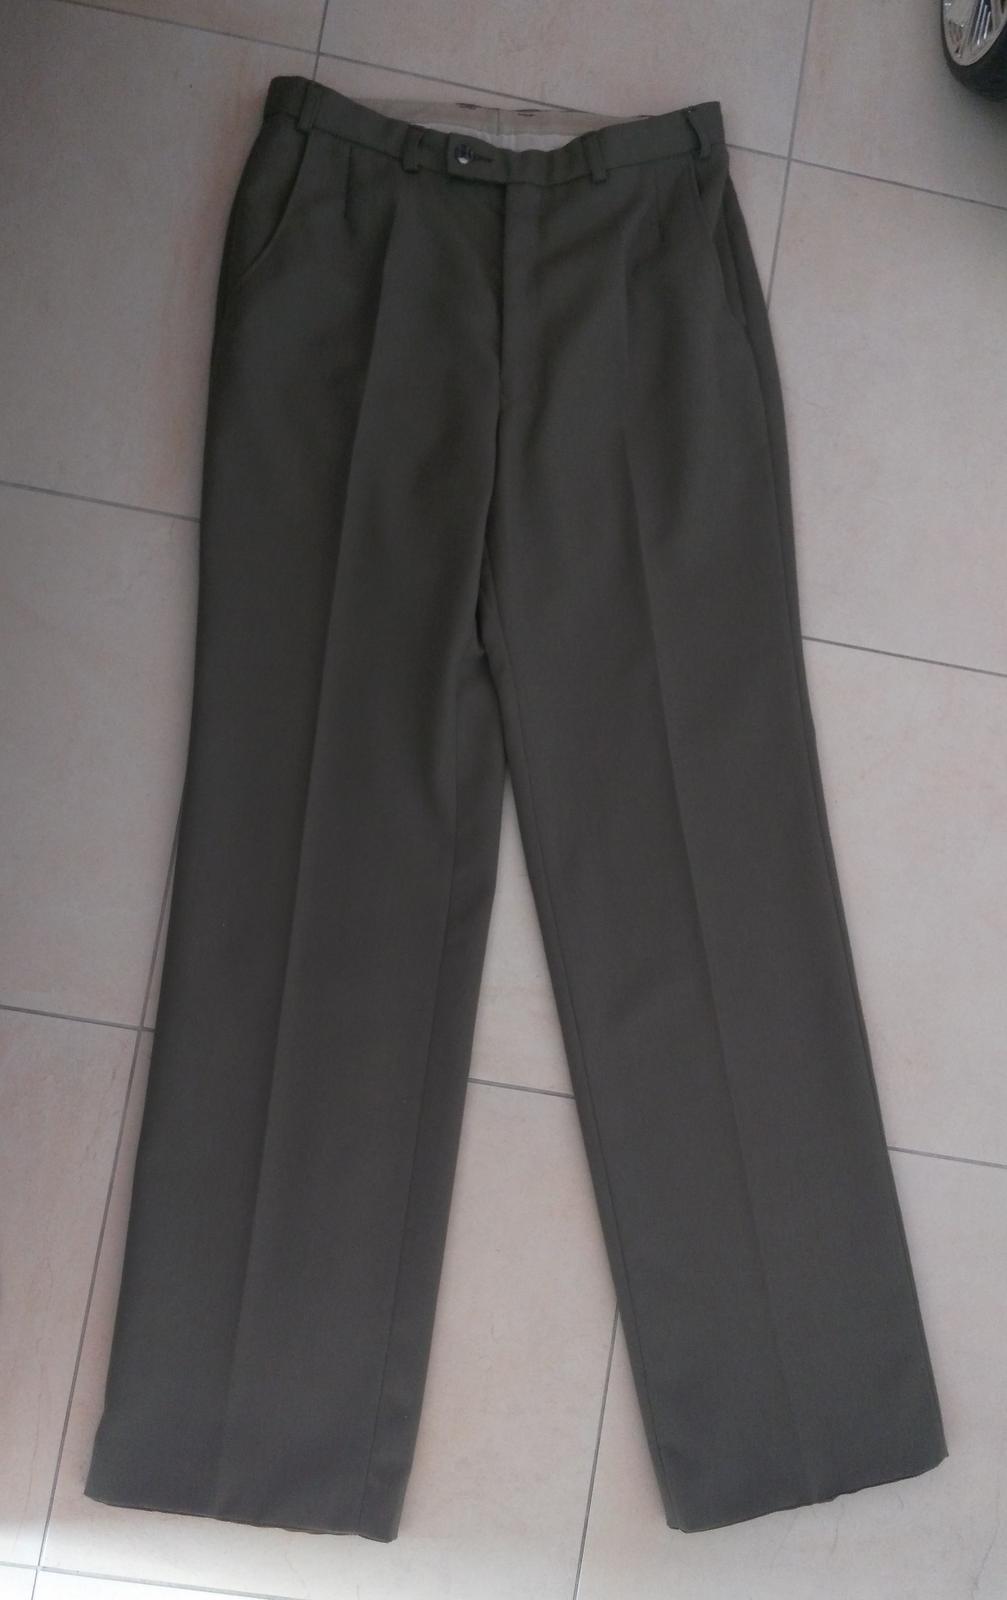 Hnedo-khaki oblek č.52 - Obrázok č. 4